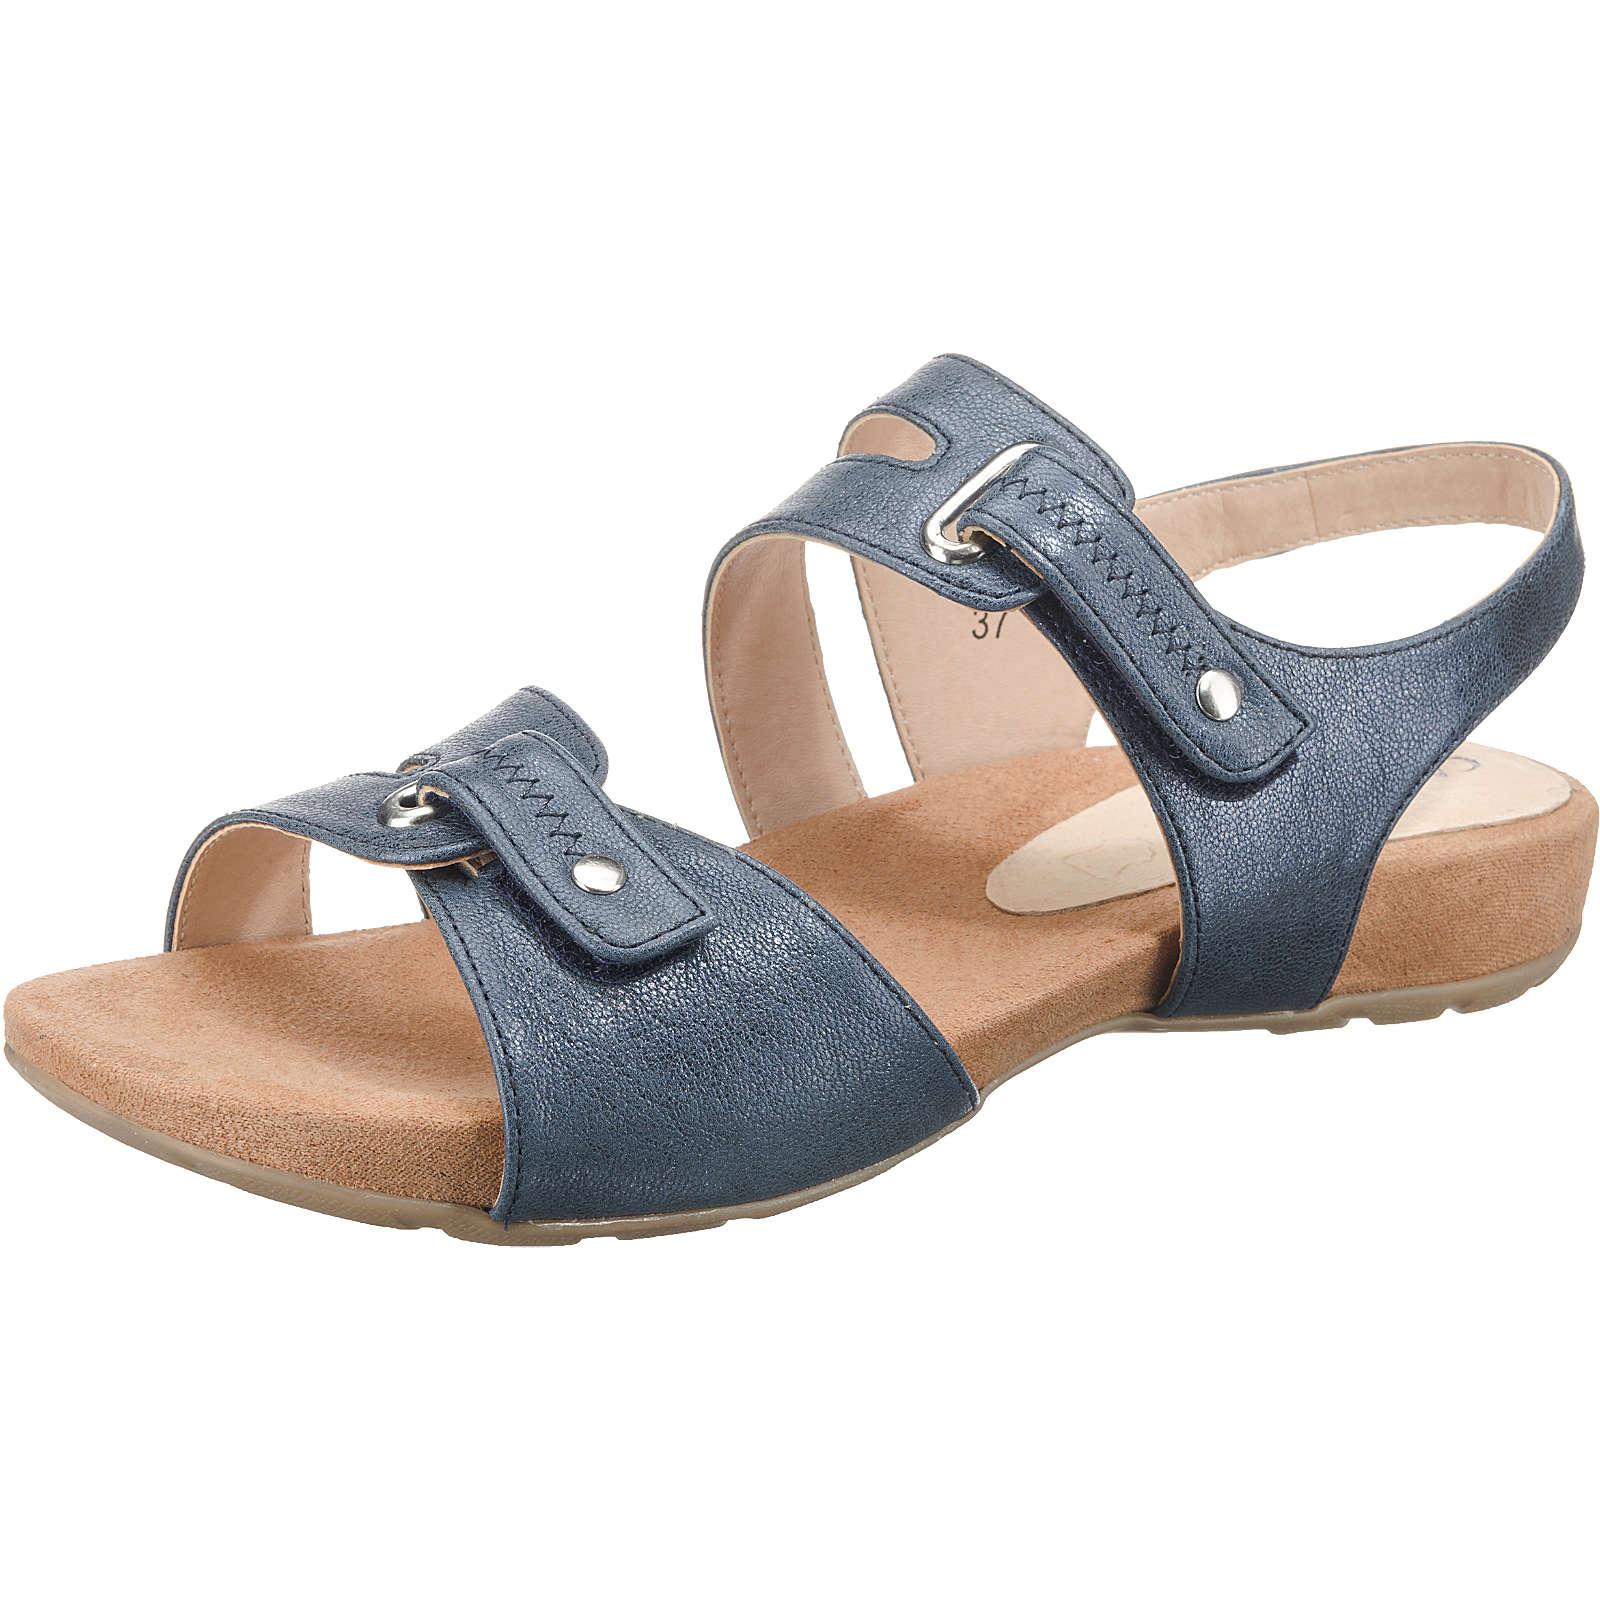 CAPRICE Komfort-Sandalen blau-kombi Damen Gr. 40